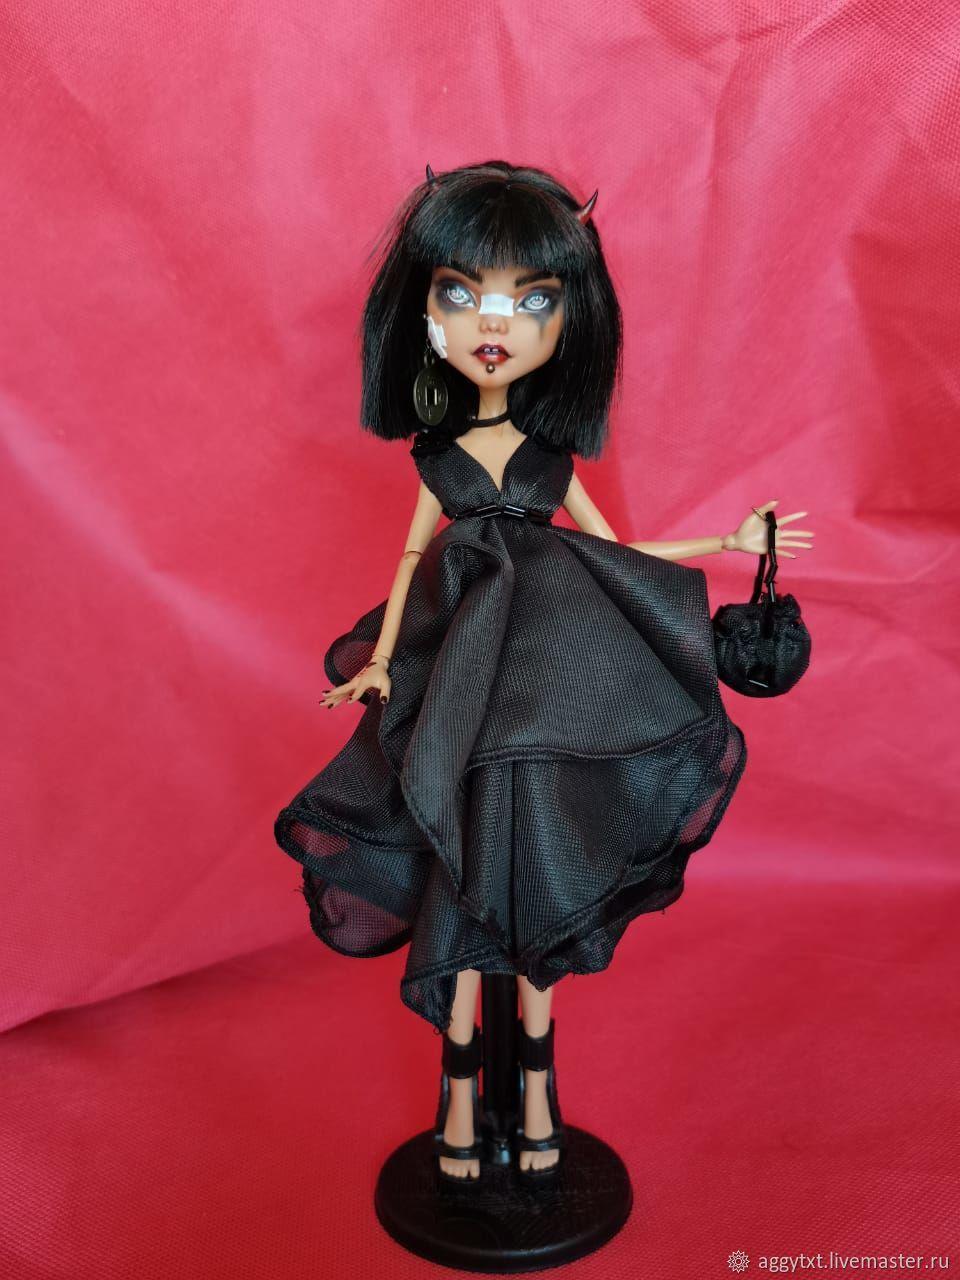 Платье на Monster High/Ever After High, Одежда для кукол, Санкт-Петербург,  Фото №1